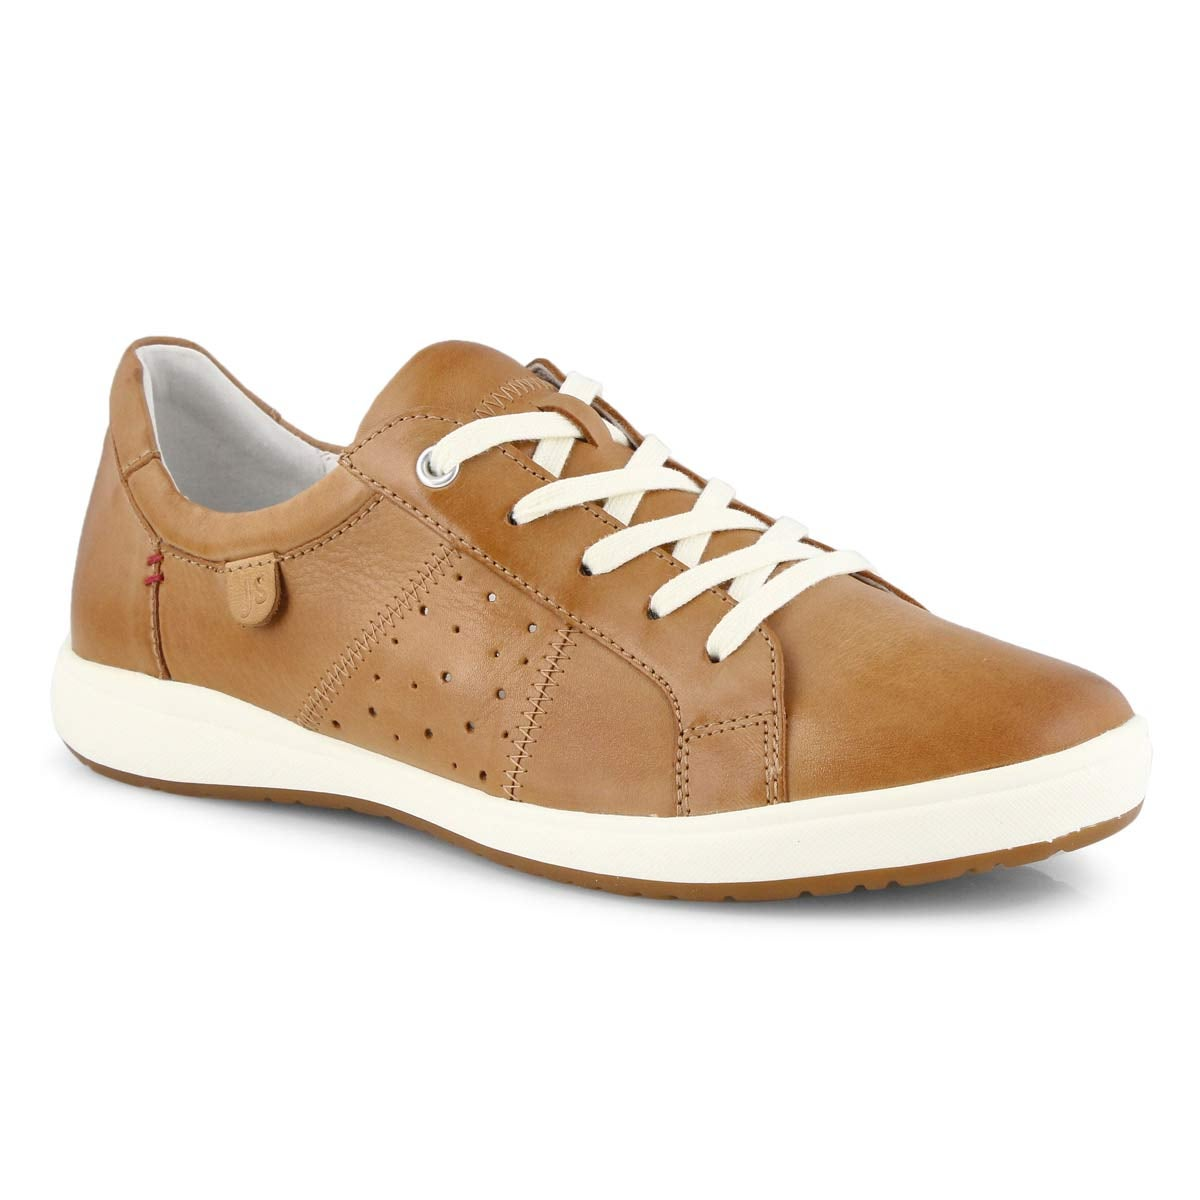 Women's Caren 01 Lace Up Sneaker - Camel